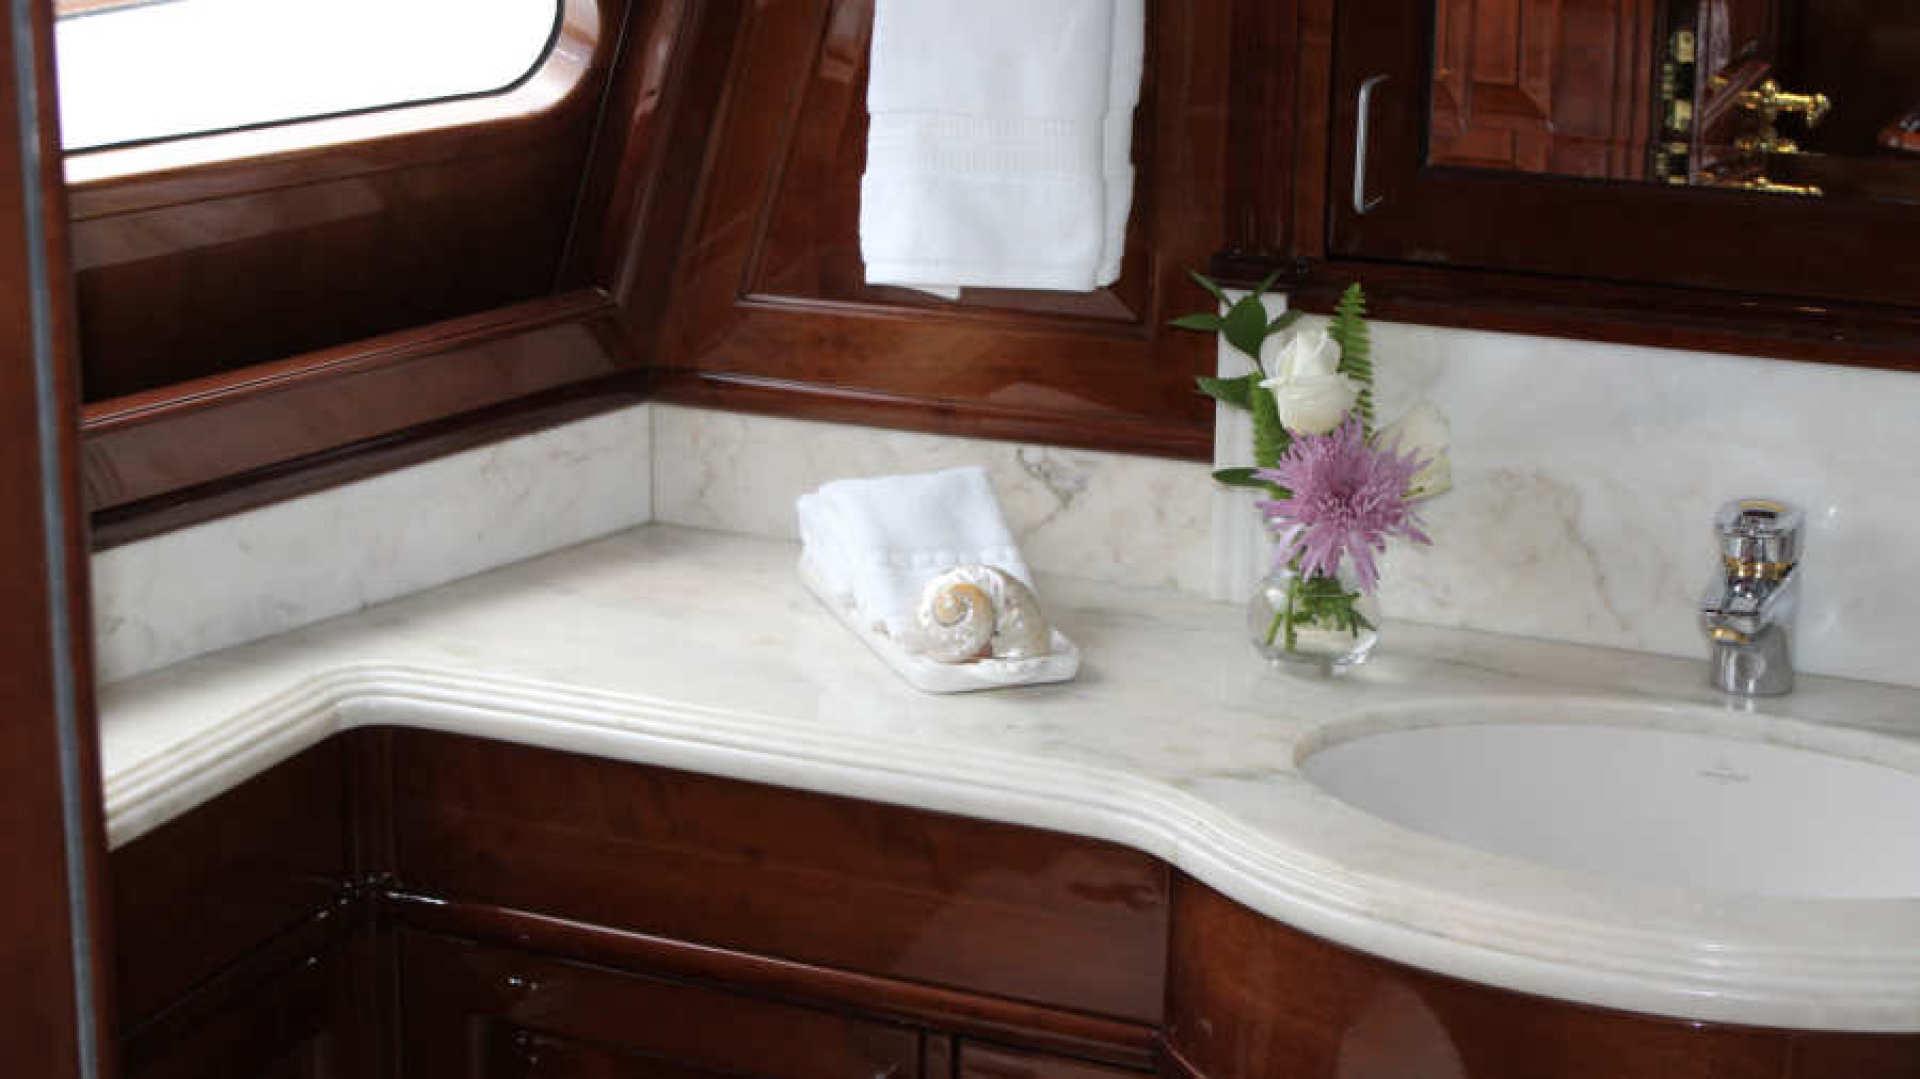 Conrad Shipyard-88 Motor Yacht 2005-Chillin Fort Lauderdale-Florida-United States-Conrad Motor Yacht 2005 Chillin-1537354 | Thumbnail